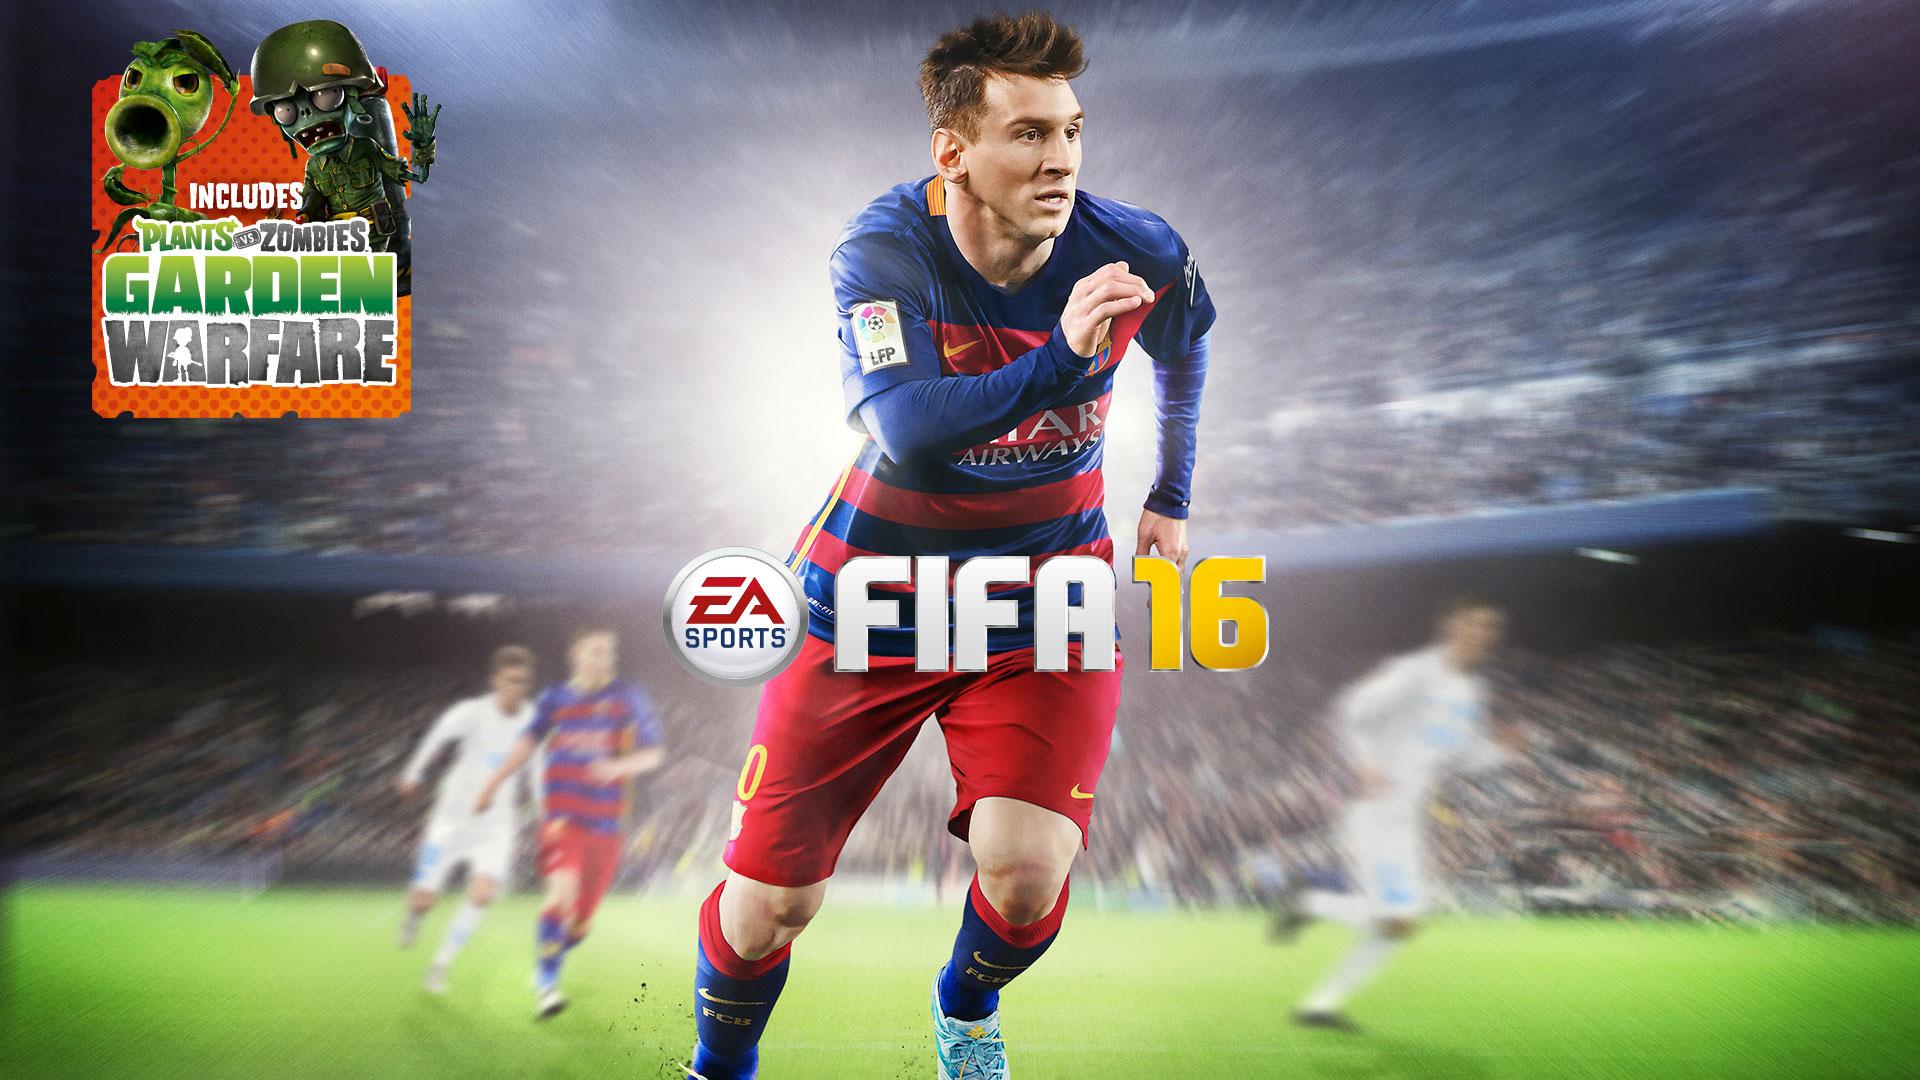 Get Plants Vs. Zombies Garden Warfare With Fifa 16 On Xbox One regarding Pvz Gw2 Event Calendar June 2021